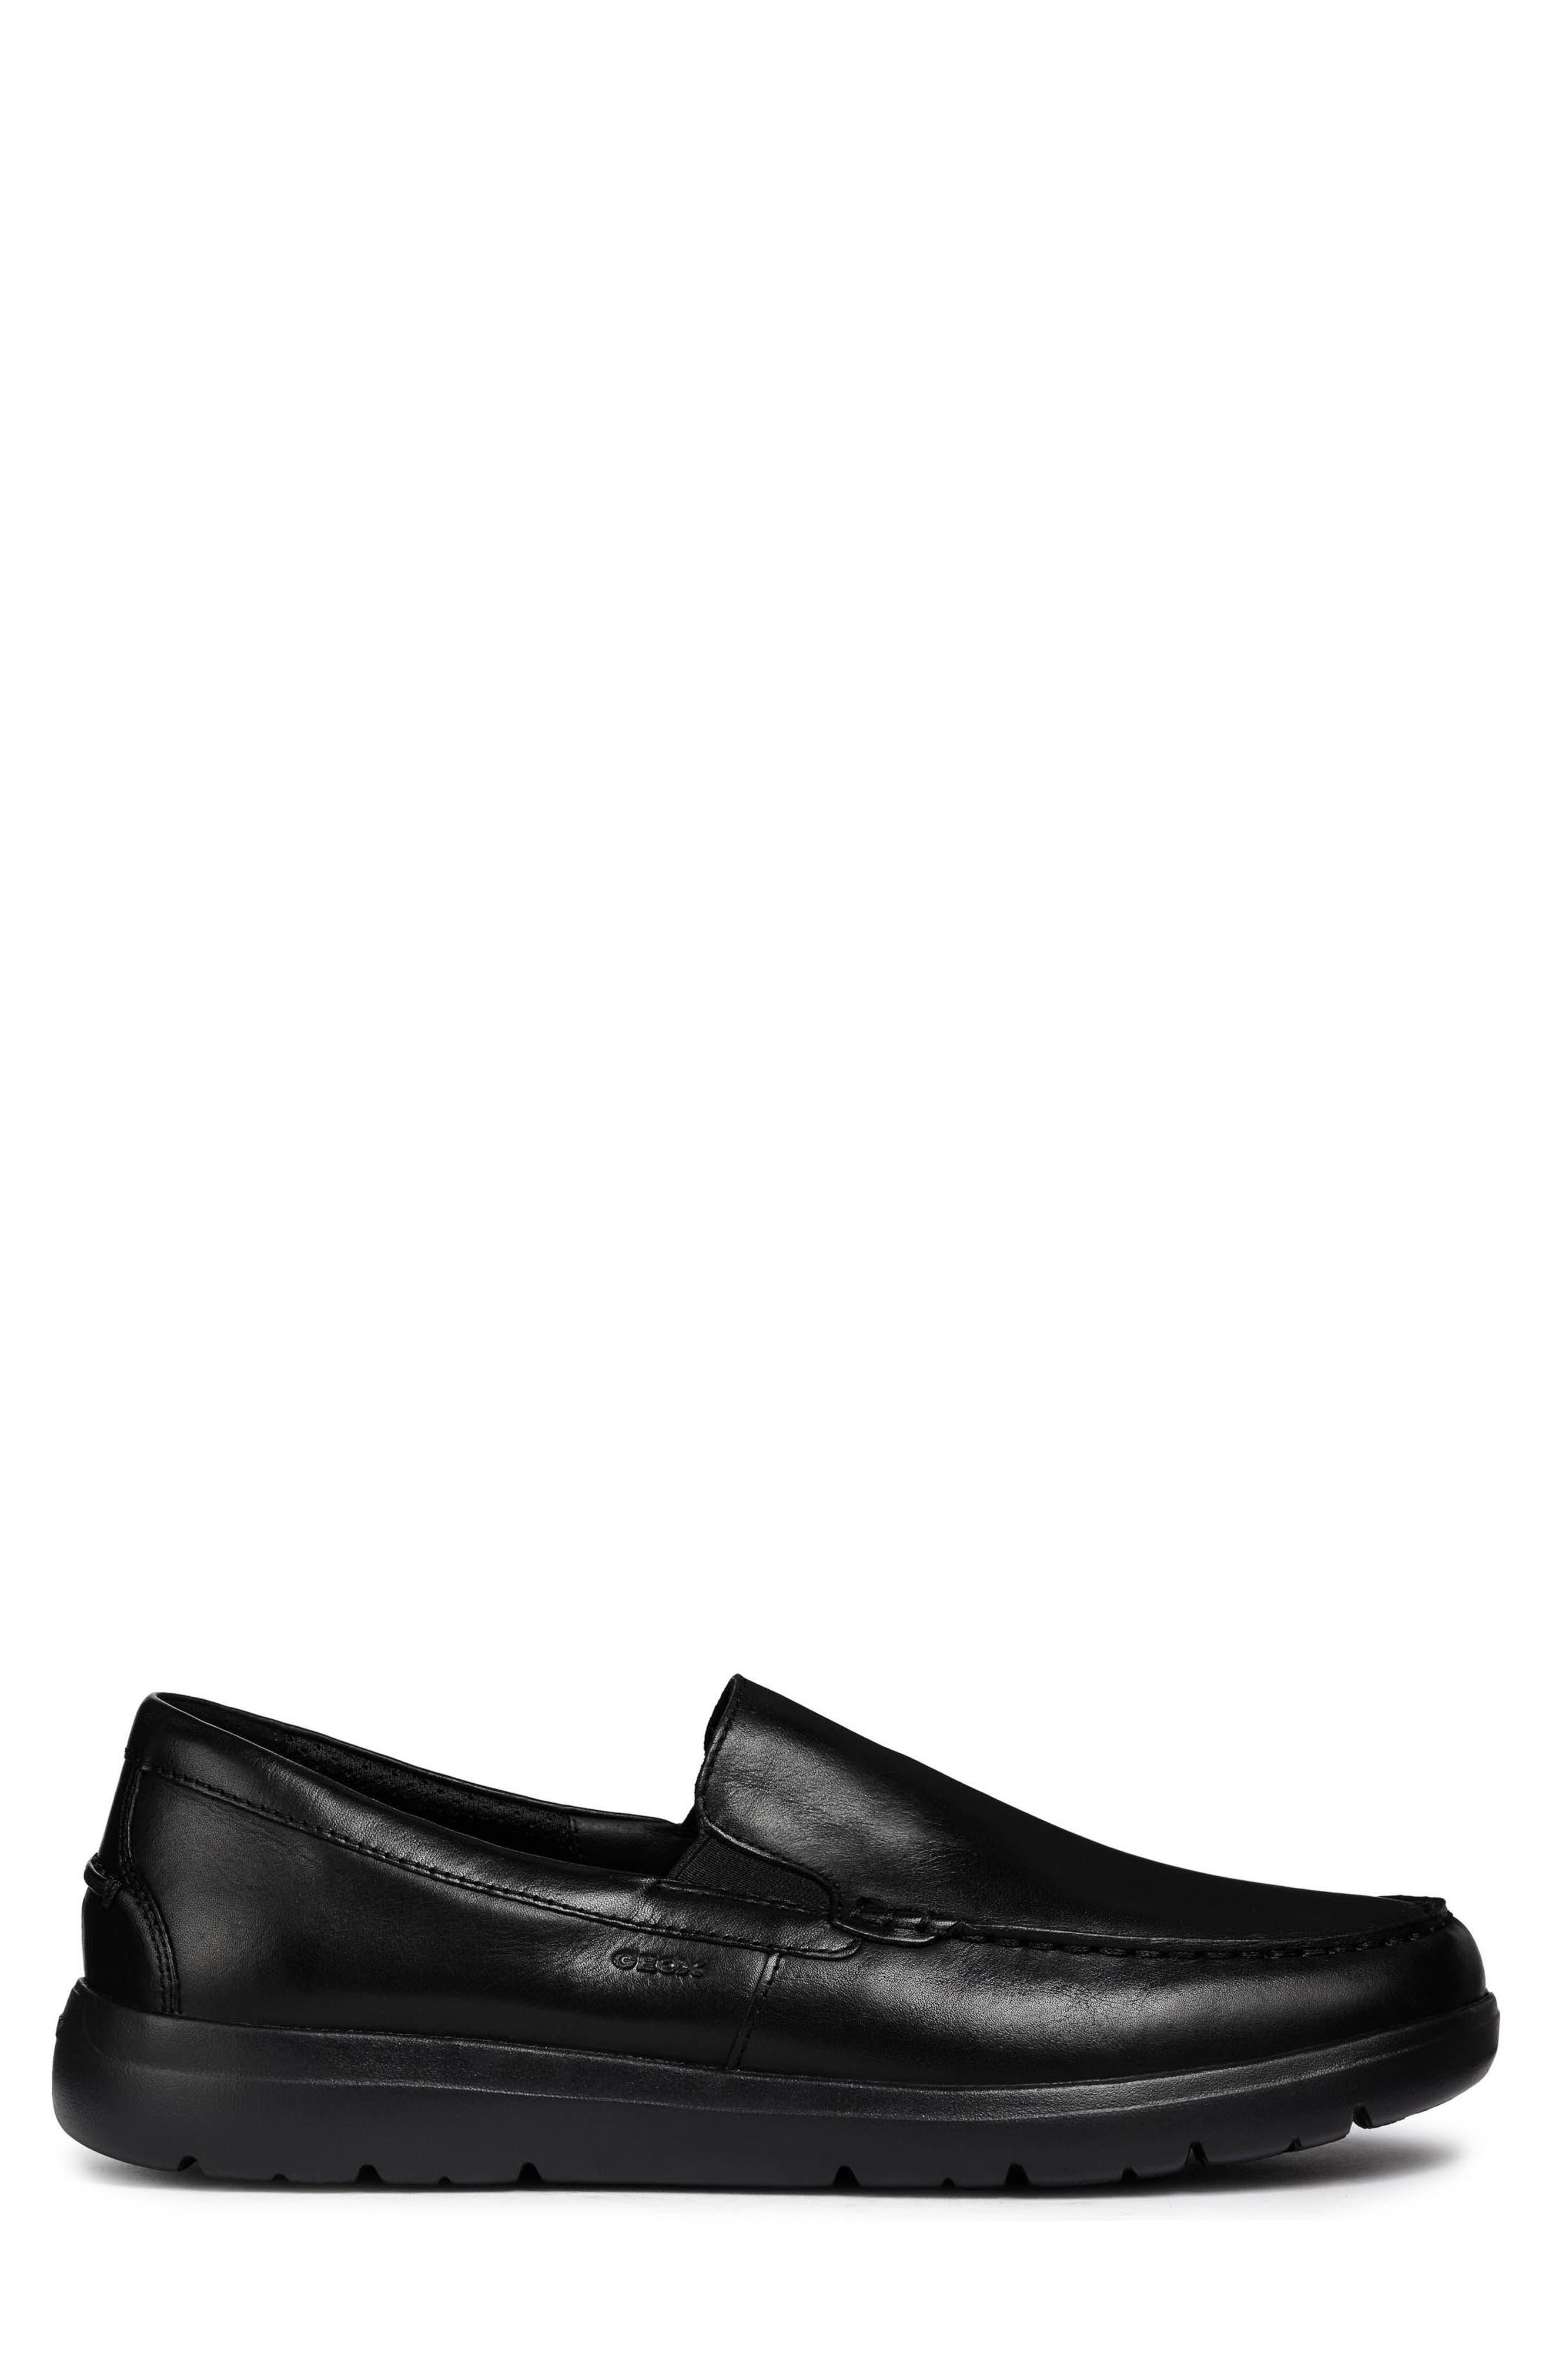 Leitan 6 Moc Toe Slip-On,                             Alternate thumbnail 3, color,                             BLACK LEATHER